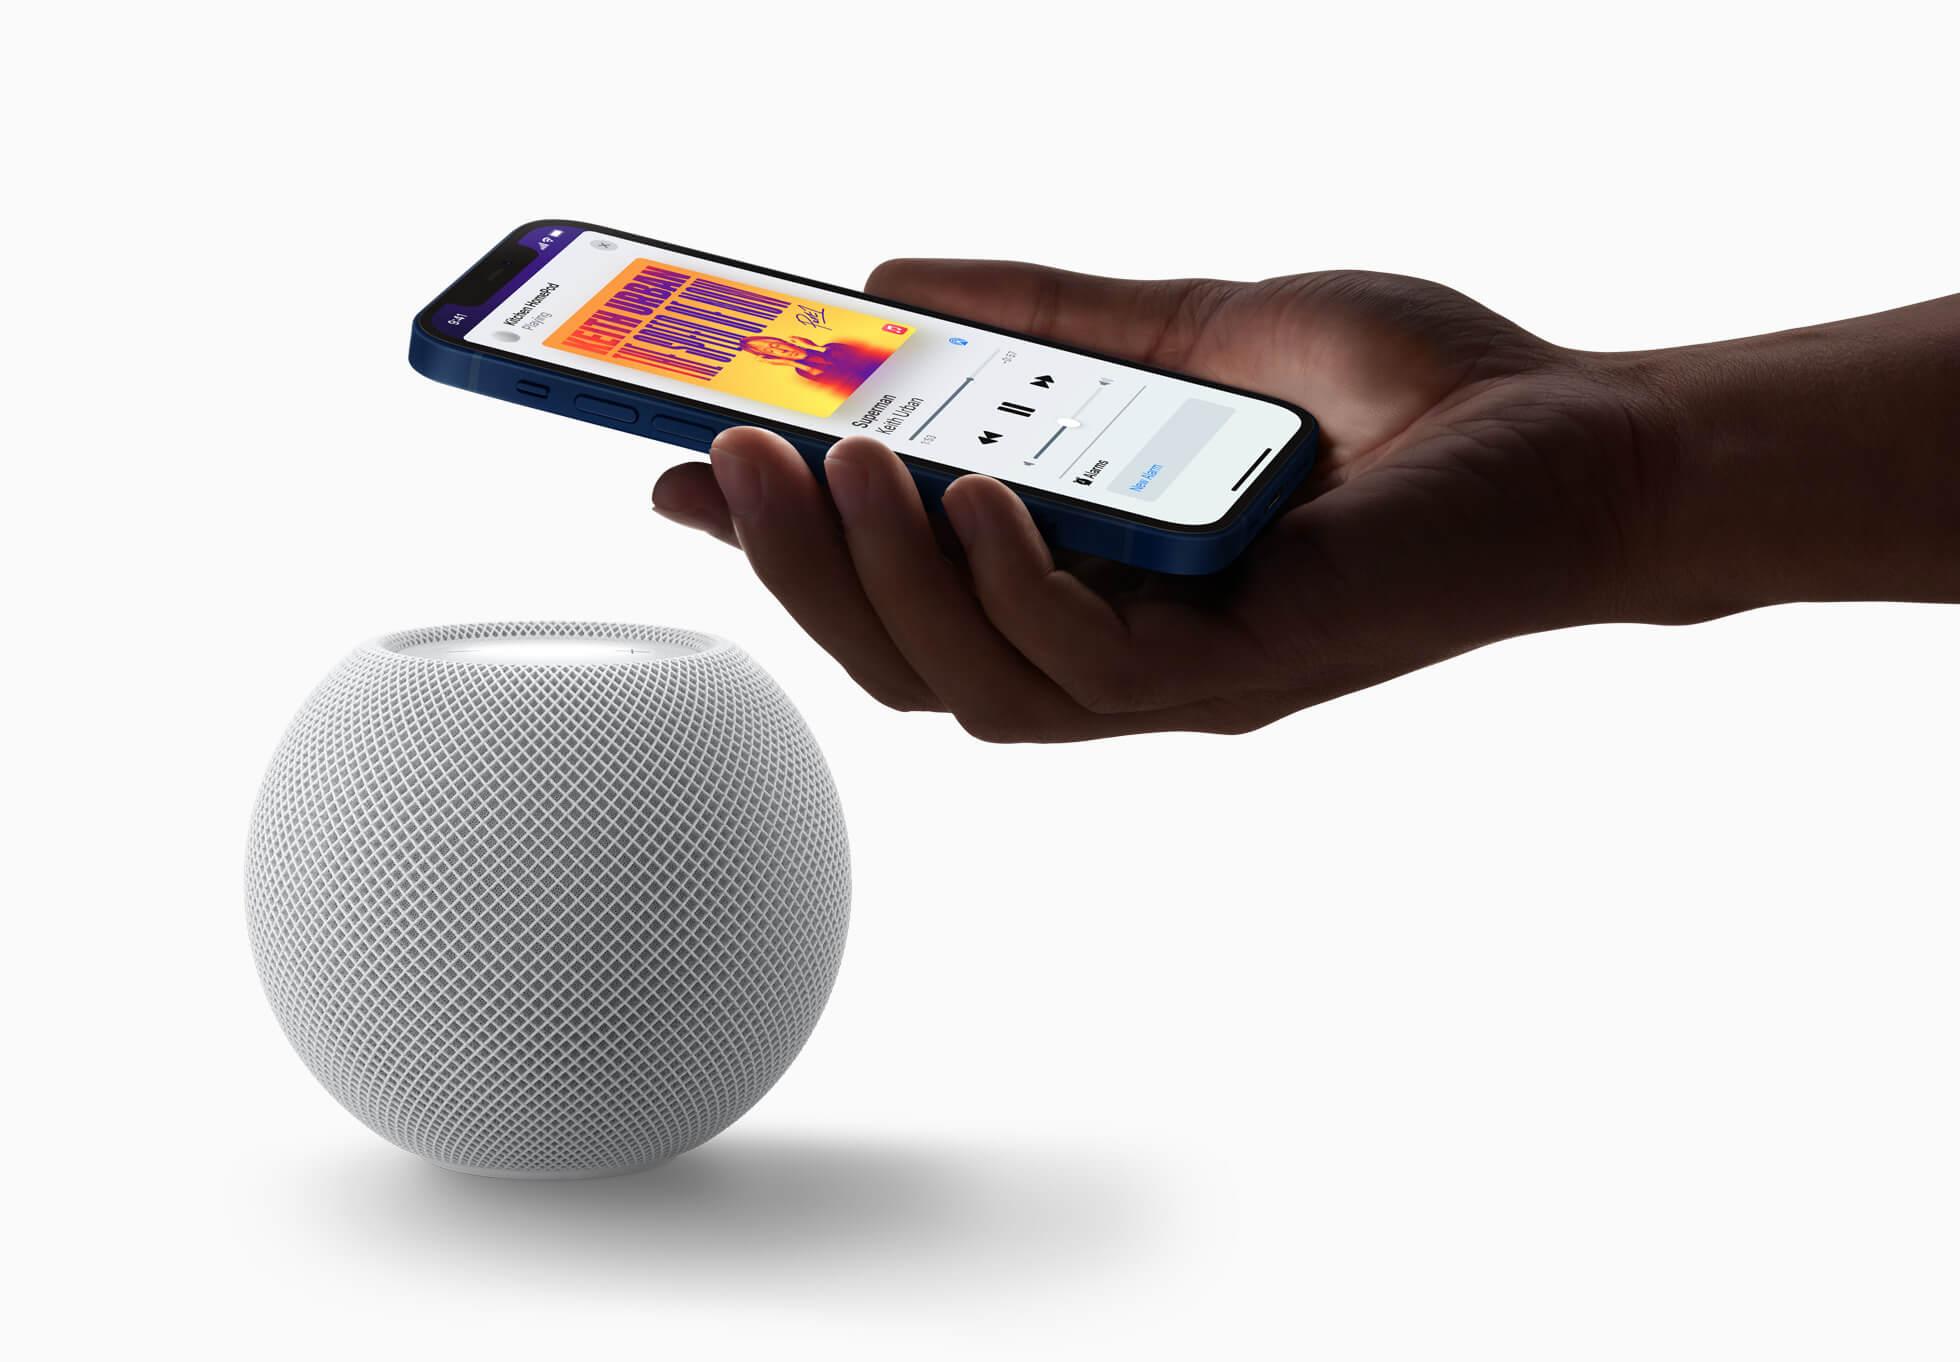 Dank HomePod Mini: Smart Speaker-Verkäufe könnten 2021 deutlich anziehen • Apfellike.com